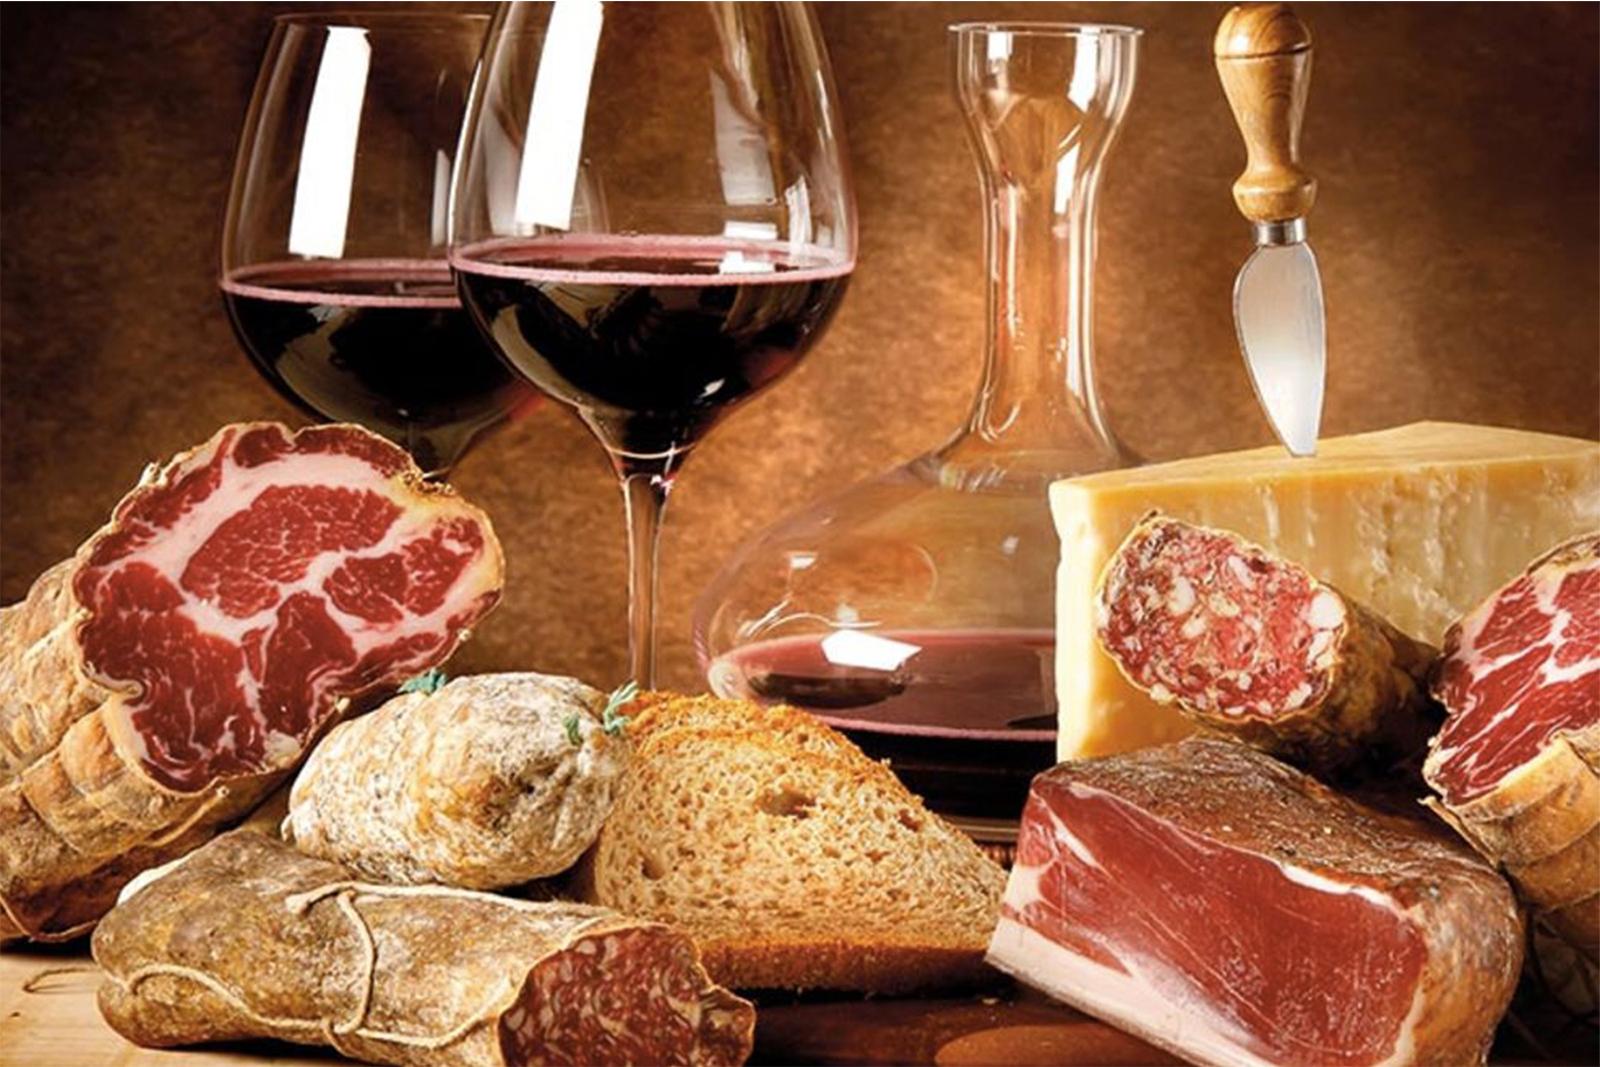 Discover-Emilia-Romagna's-gastronomy-7-day